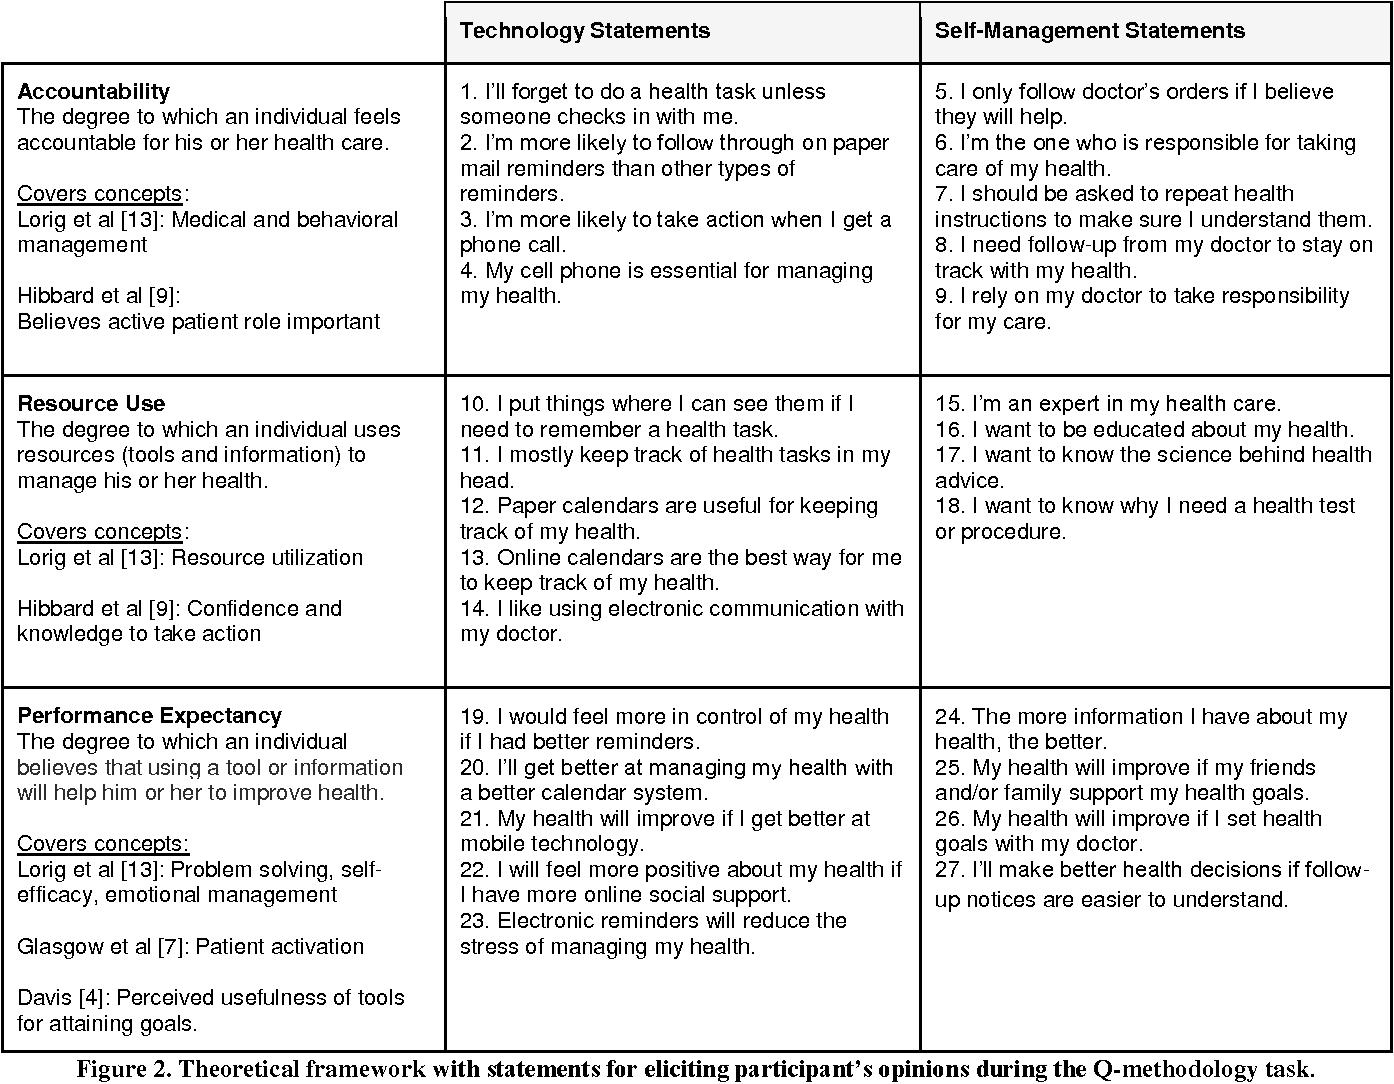 Figure 2 from Understanding Design Tradeoffs for Health